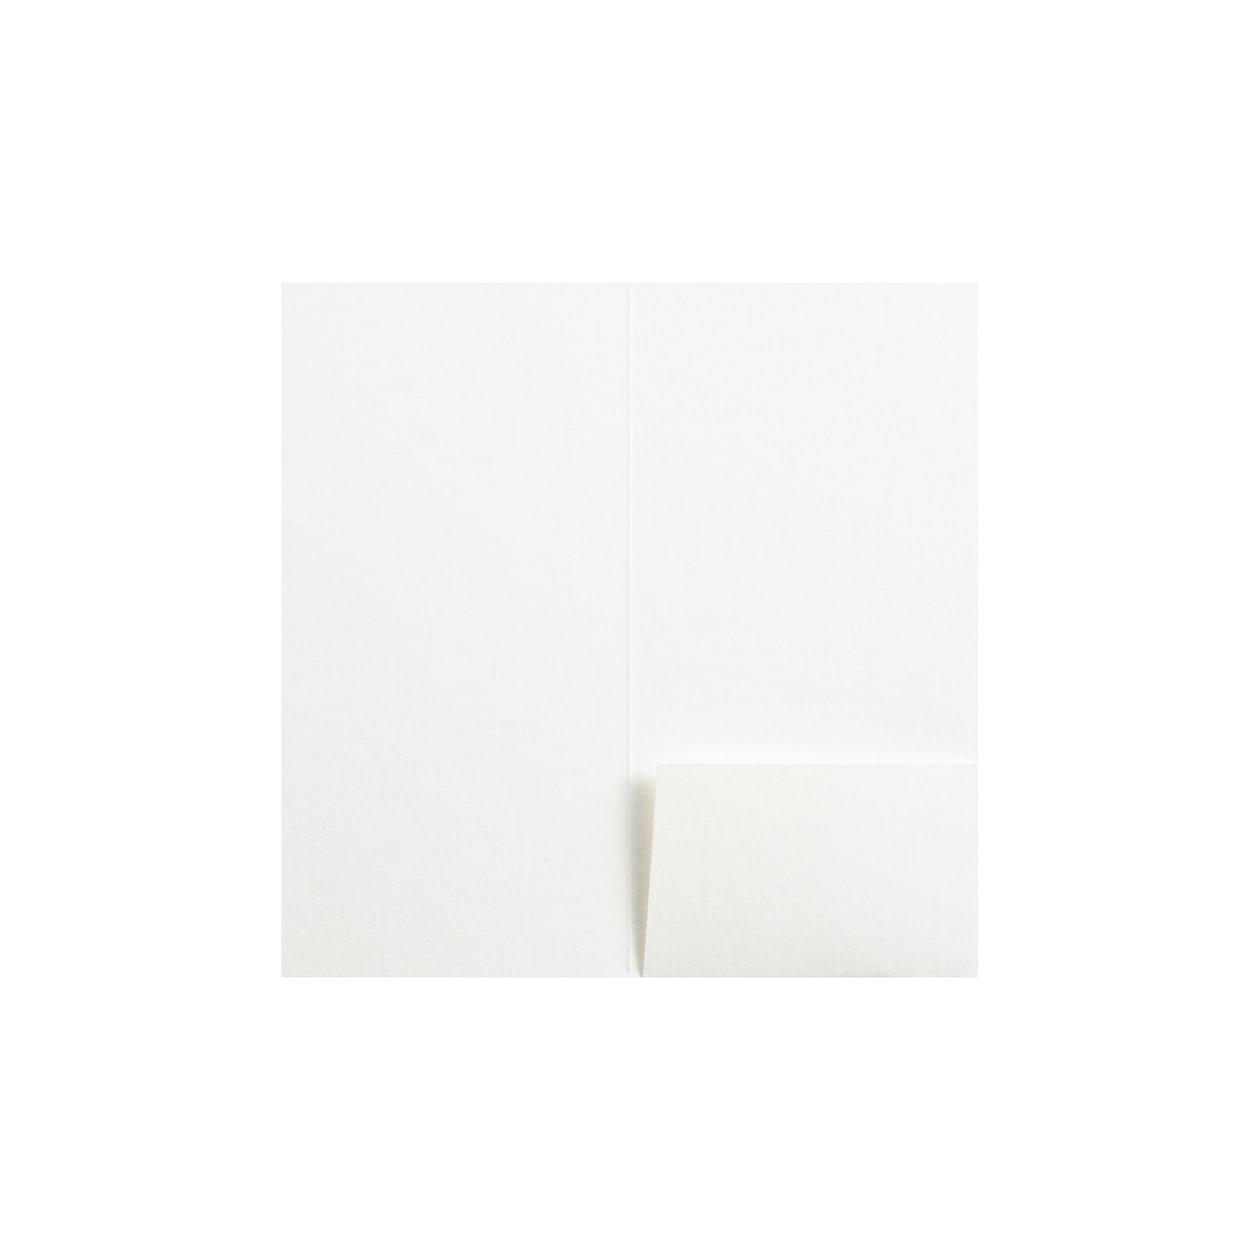 A6細フォルダー 1ポケット HAGURUMA Basic プレインホワイト 260g